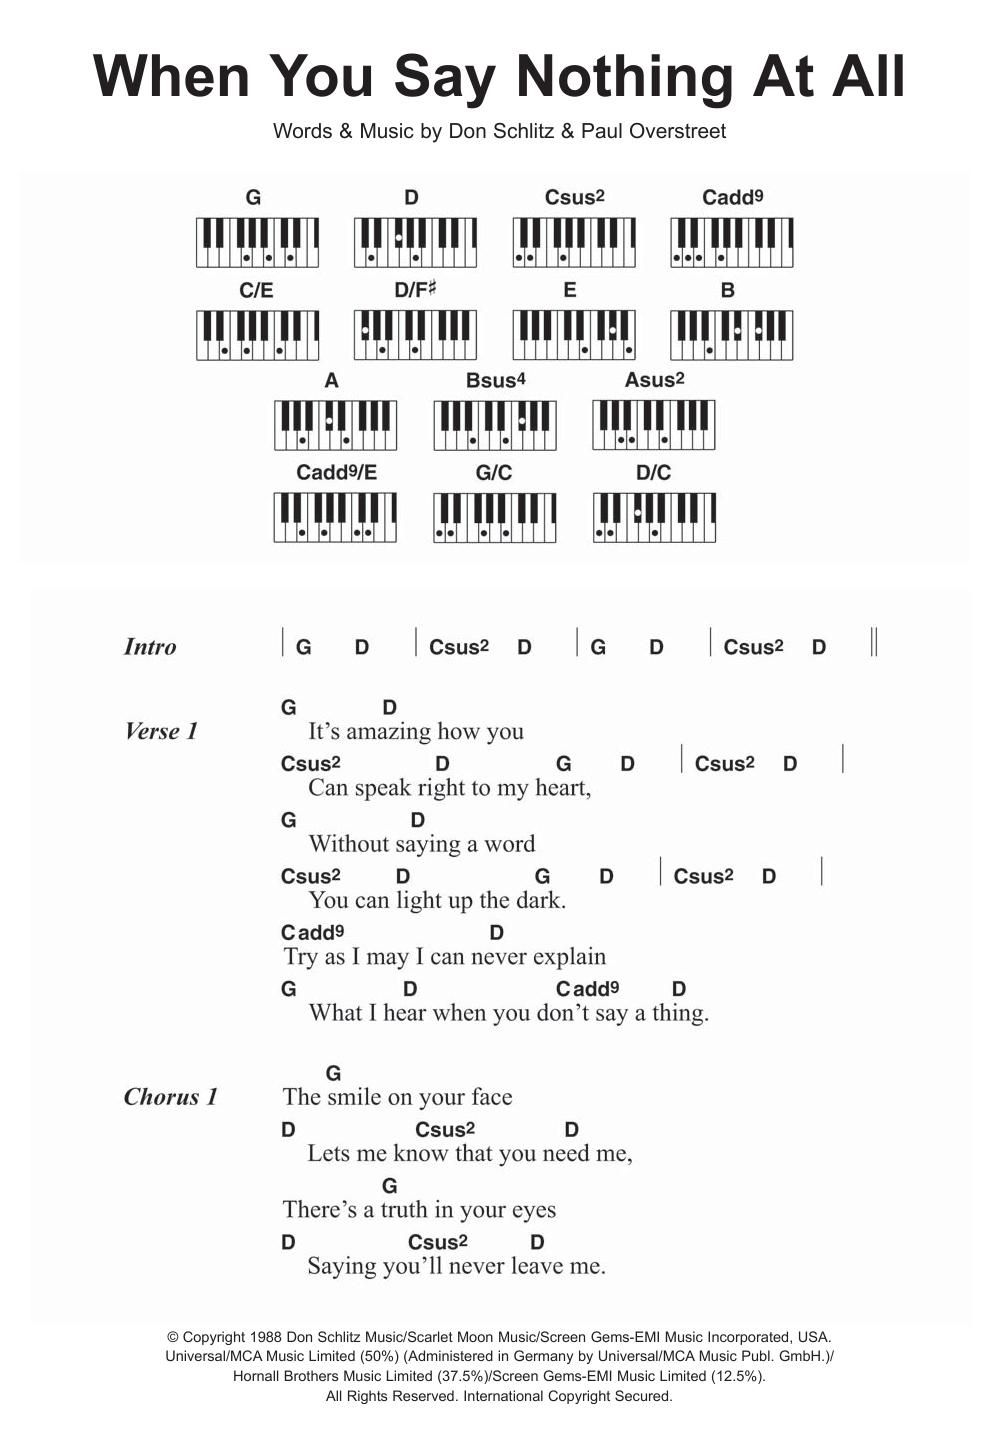 Sheet Music Digital Files To Print Licensed Ronan Keating Digital